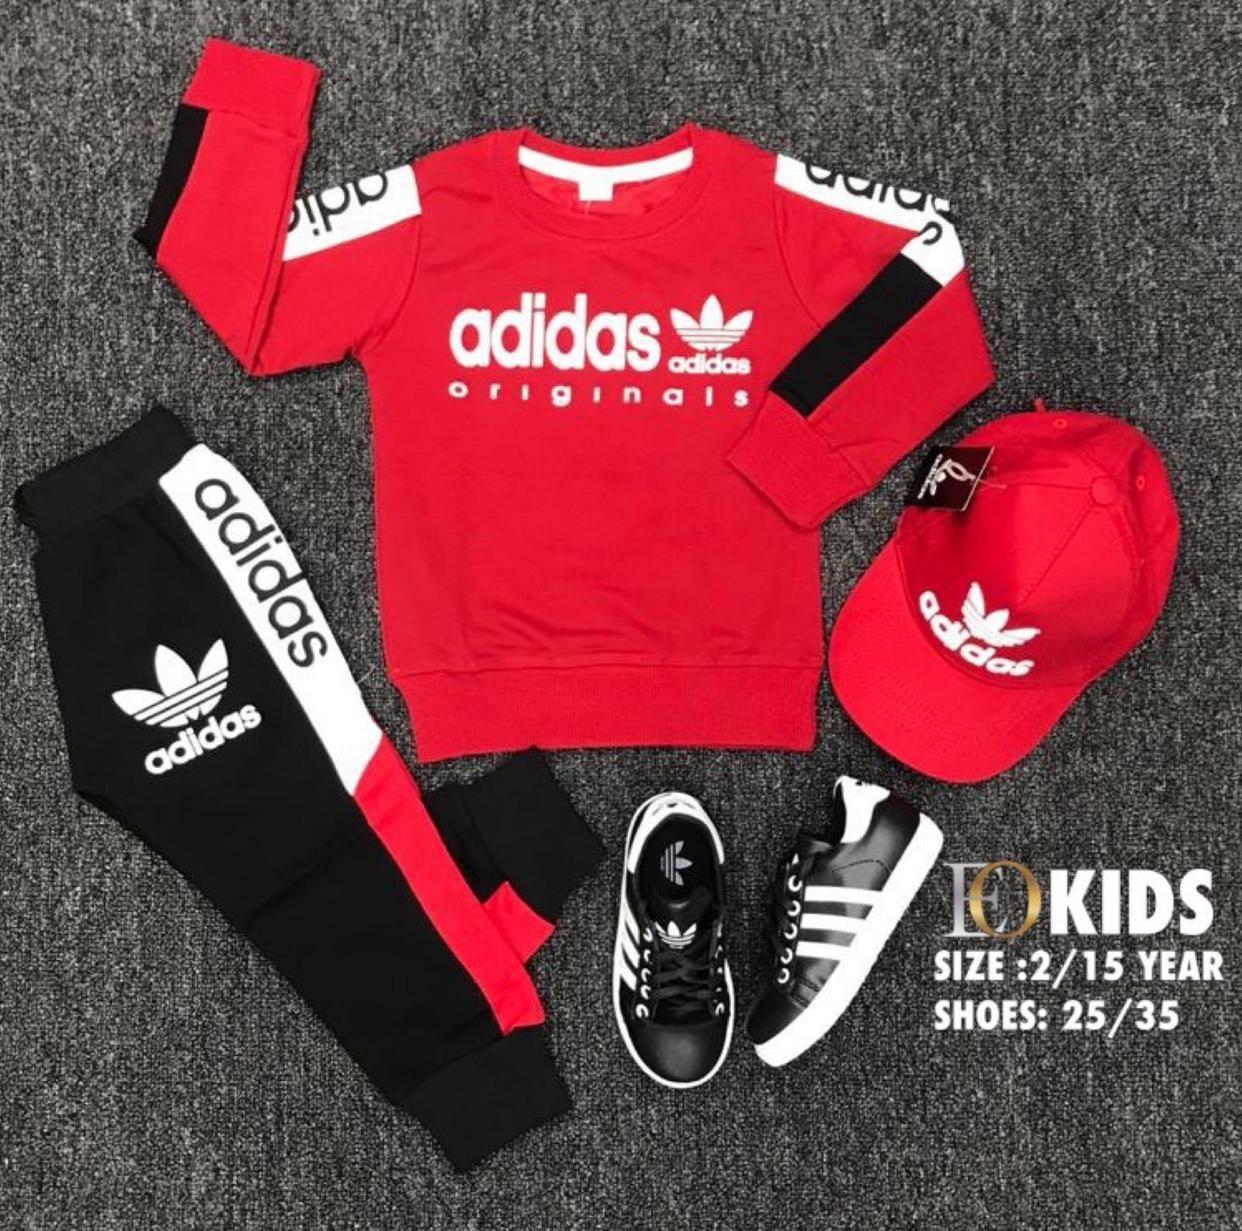 A05bd189 935c 4197 Acd2 E40d6ccf7949 Kids Activewear Boys Clothes Style Kids Outerwear [ 1231 x 1242 Pixel ]